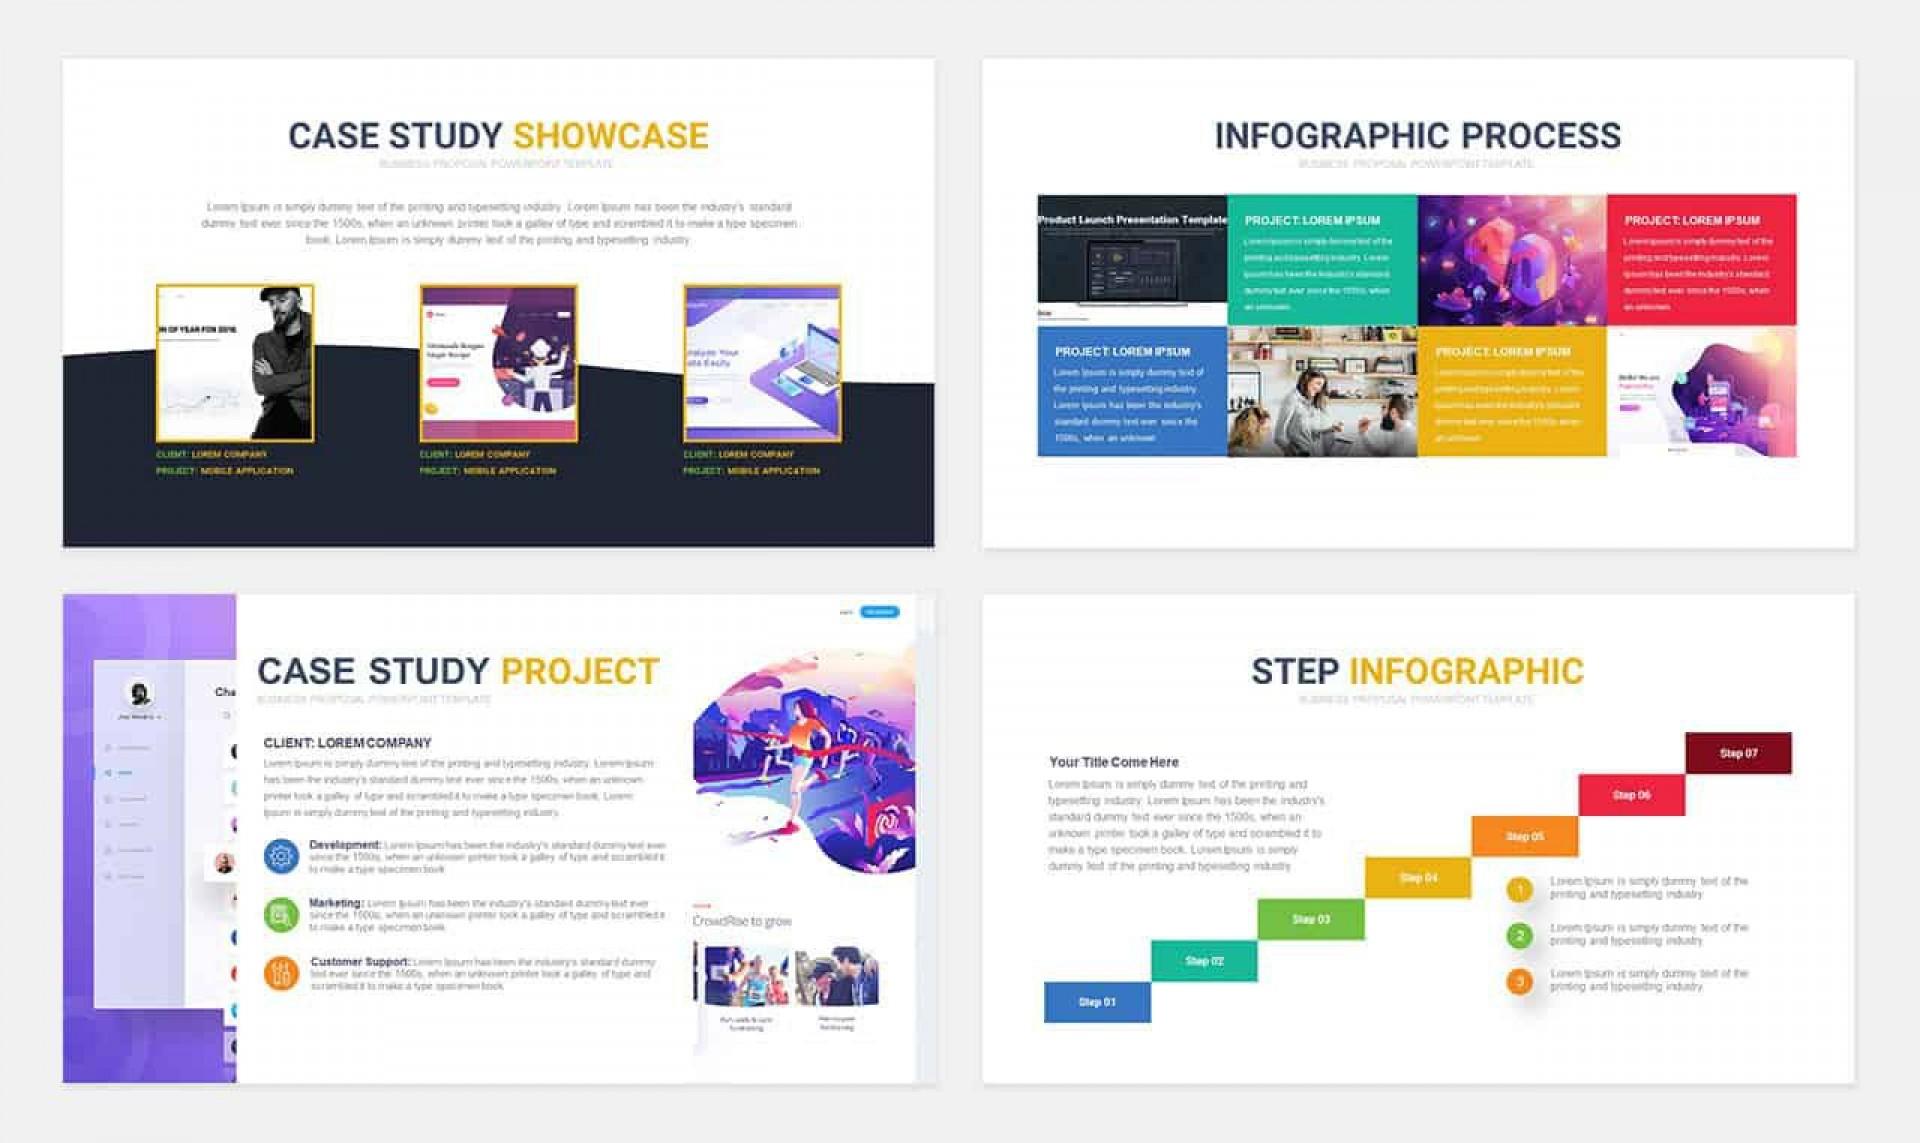 007 Breathtaking Free Download Busines Proposal Template Ppt High Definition  Best Plan Sample Plan.ppt 20201920